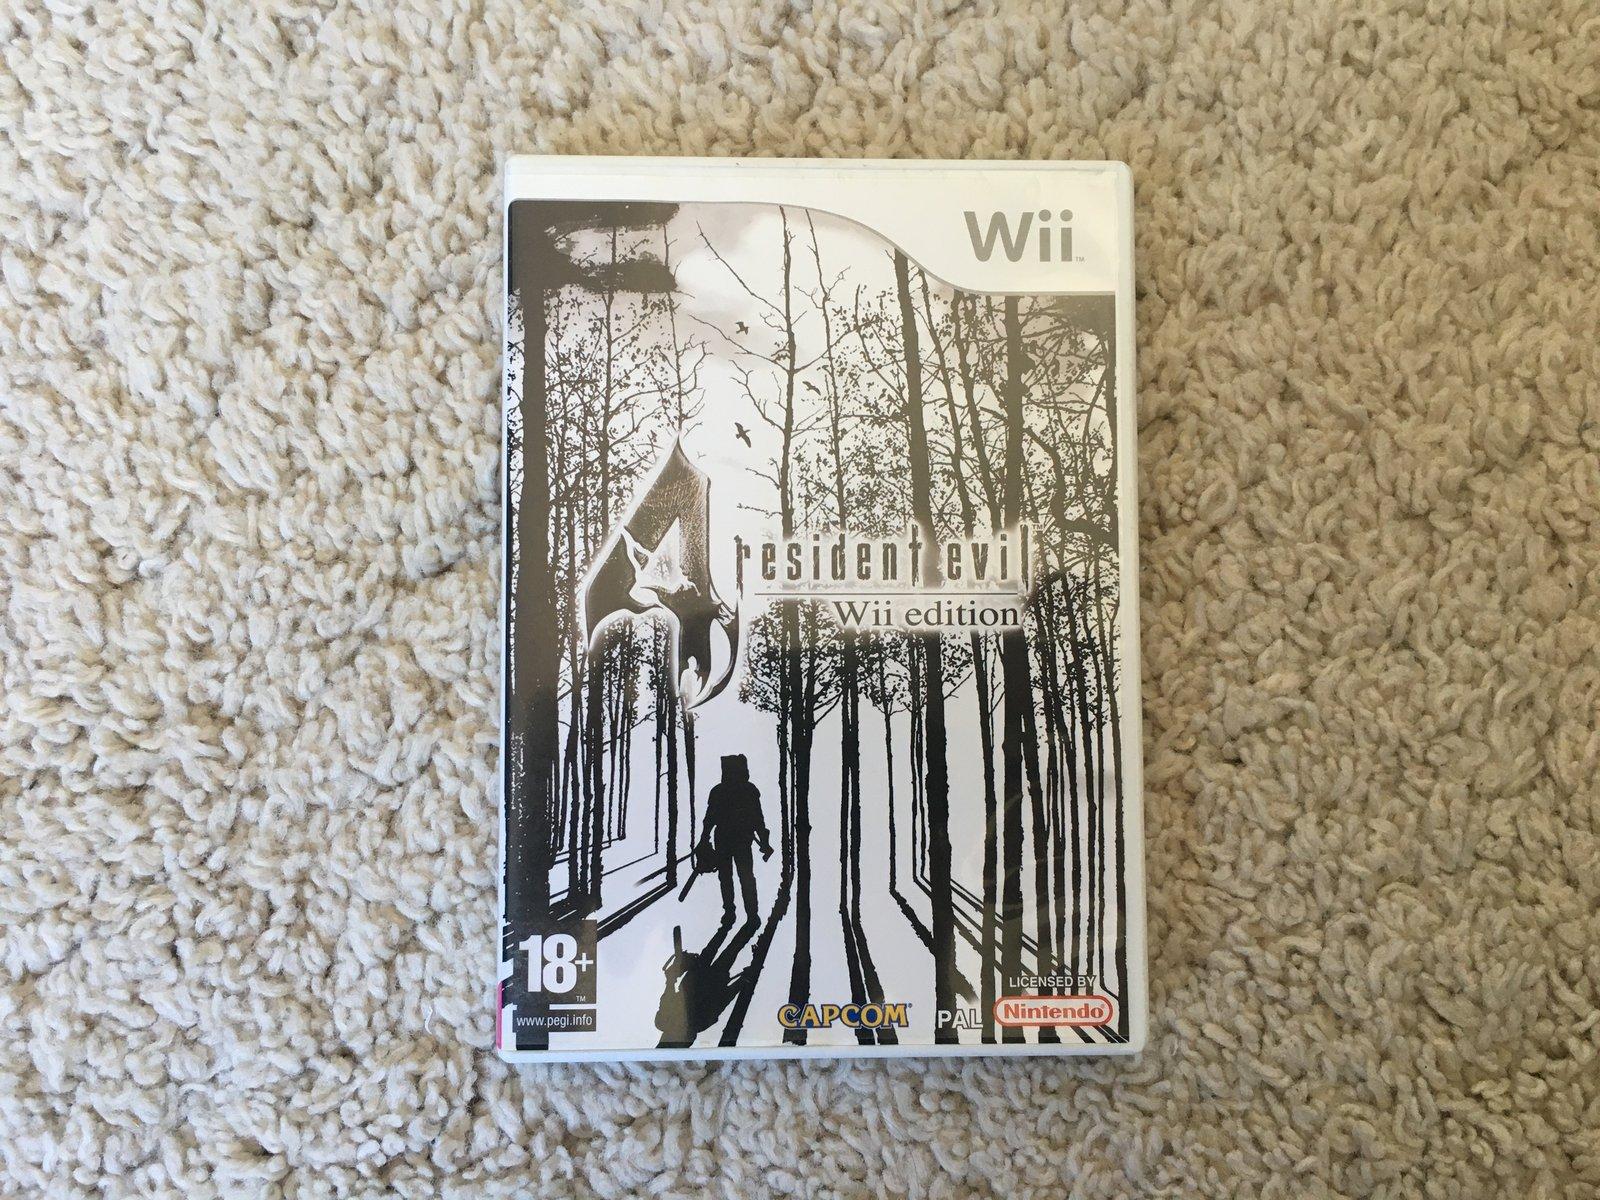 [VDS/ECH] WiiU (Sing Party), Lot jeux Wii 20€ !! MAJ 24/06/2020 200624101936117882